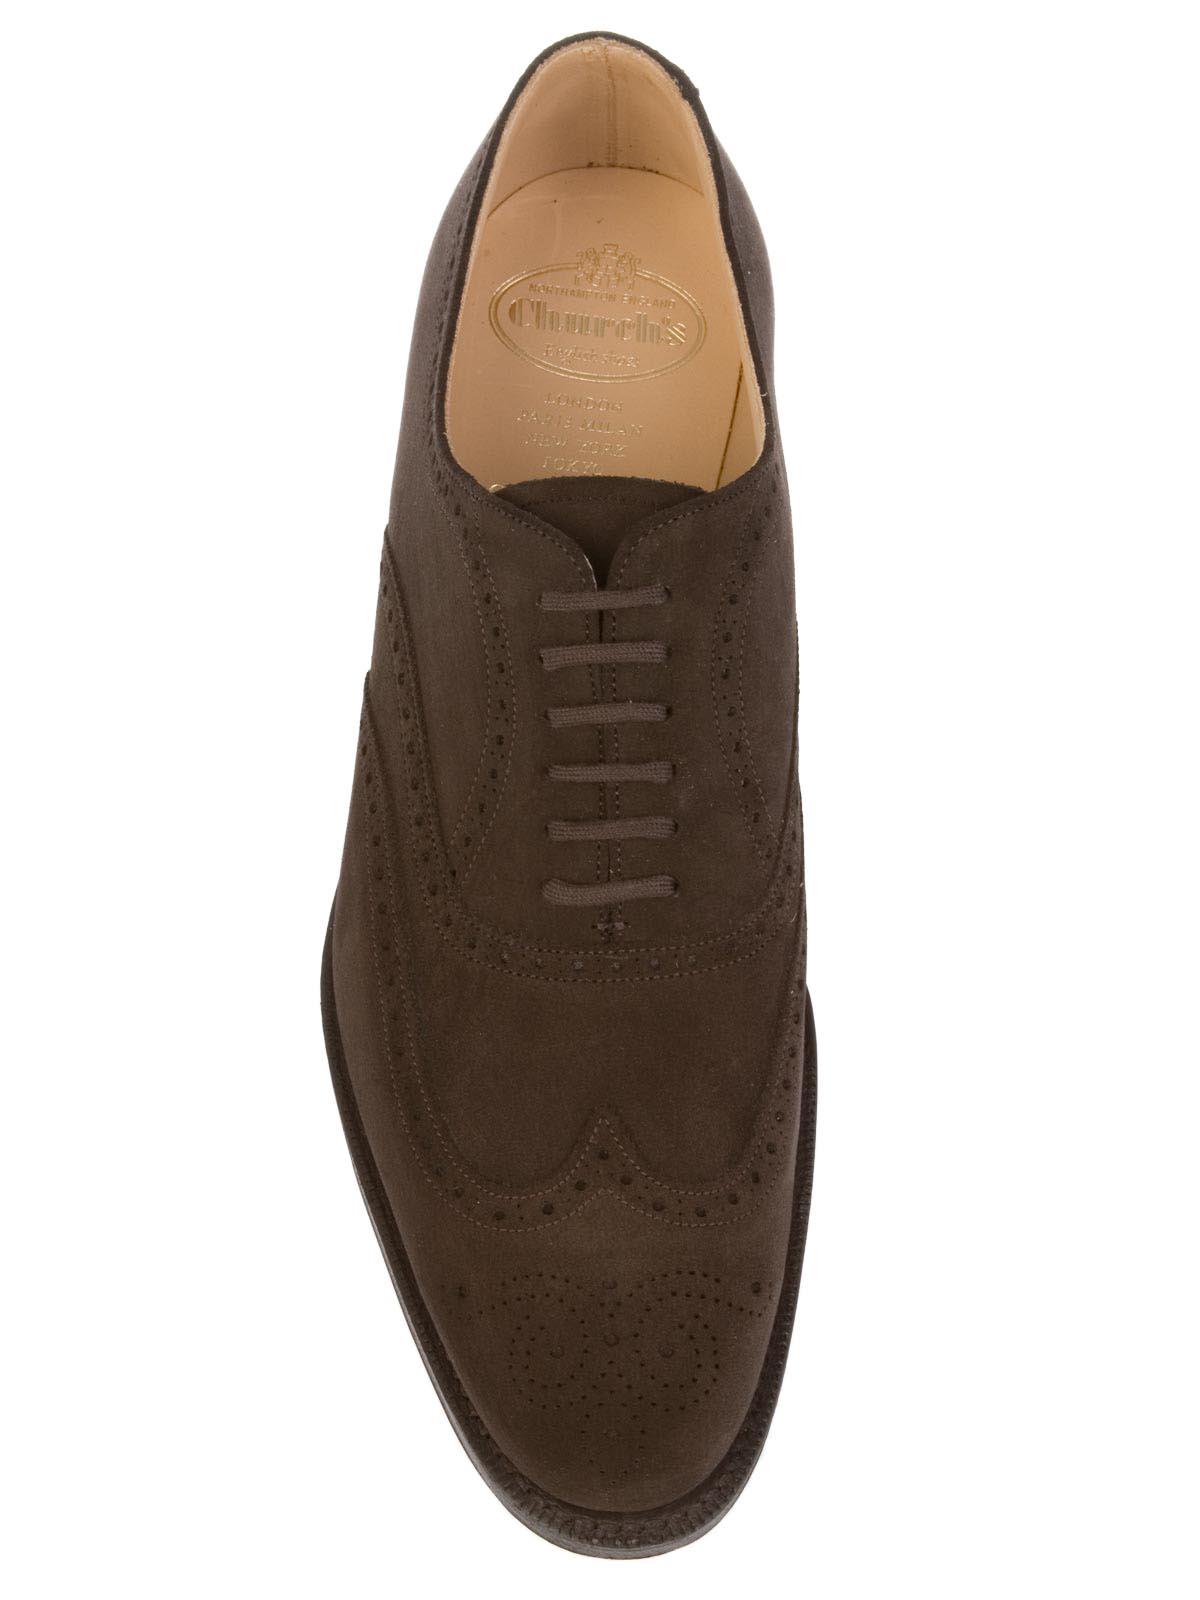 Picture of CHURCH'S   Men's Berlin Shoe